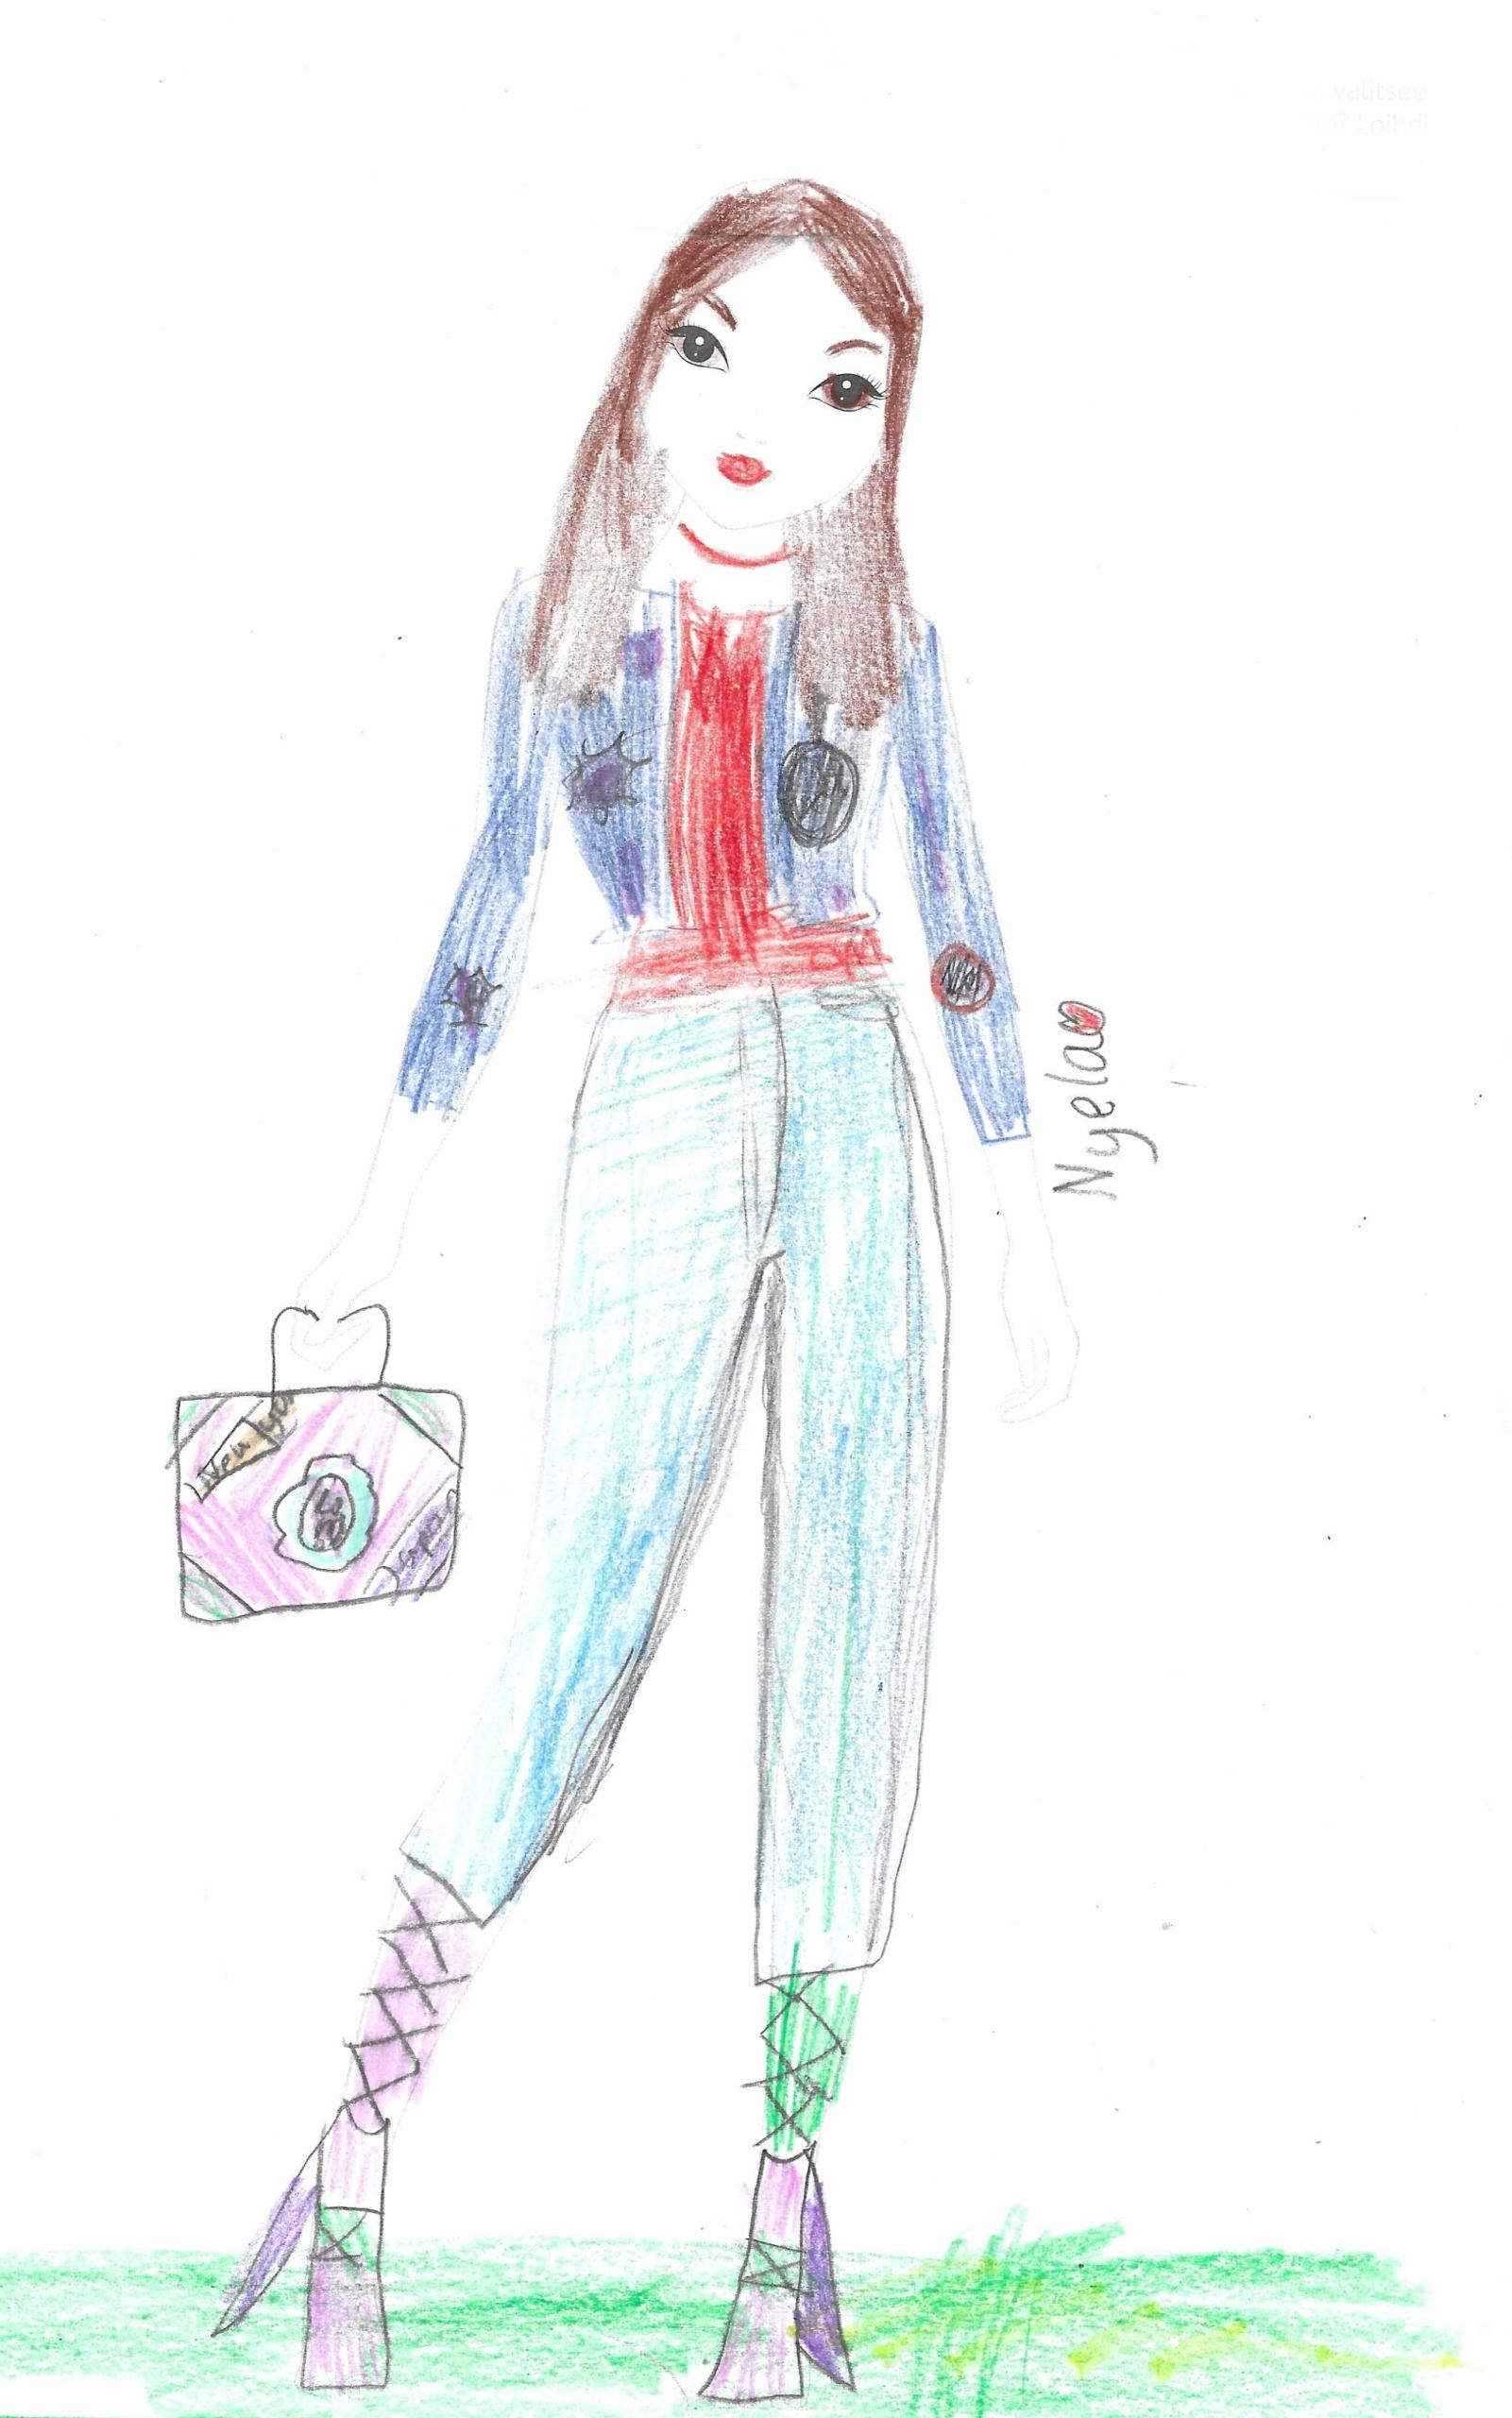 Tinja V., 7 Jahre, aus Helsinki